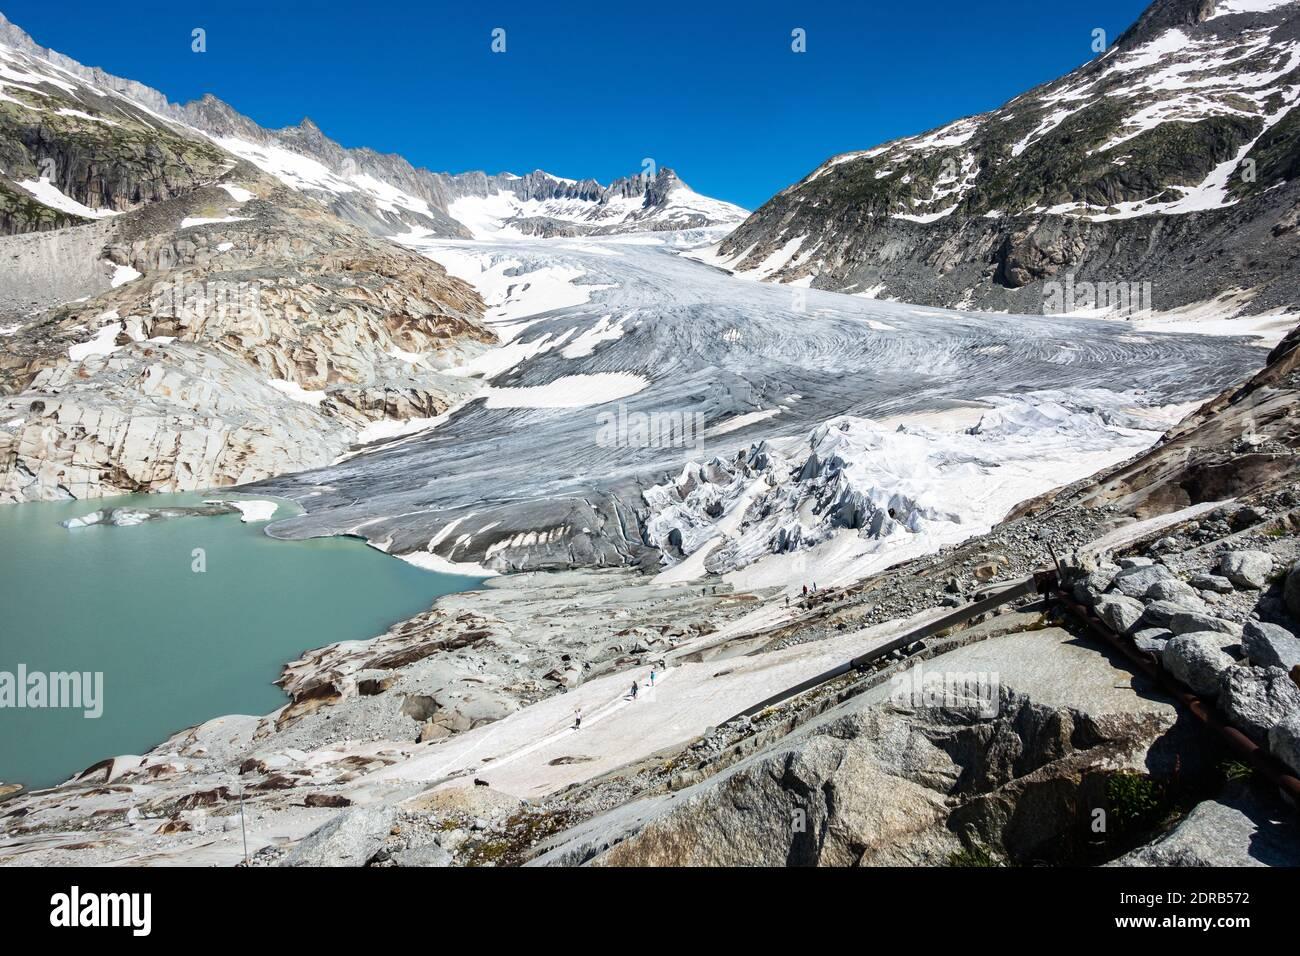 Landscape of Rhone Glacier, the source of Rhone River, Valais, Switzerland Stock Photo